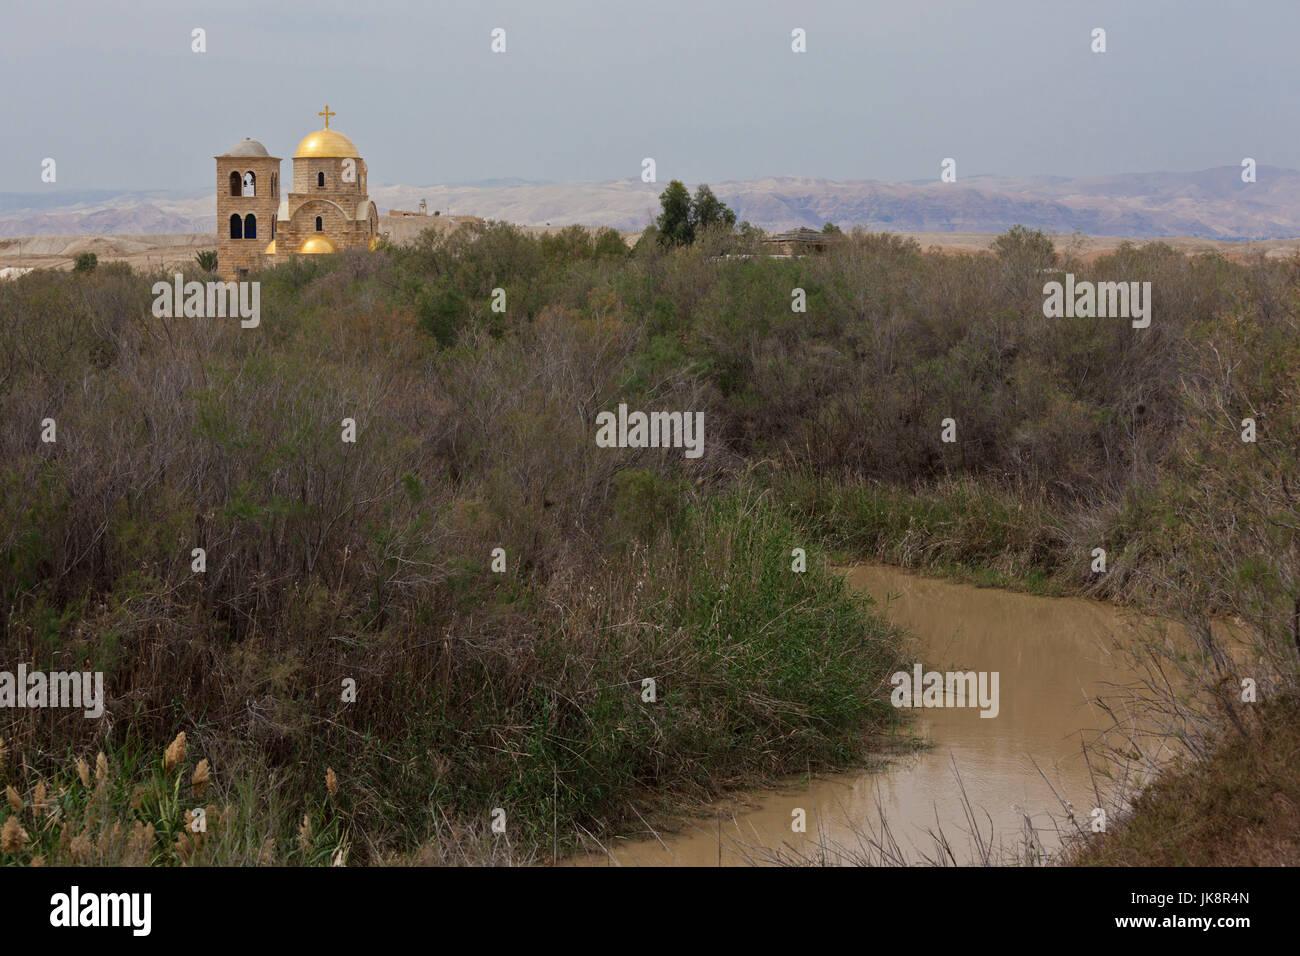 Jordan, Jordan River Valley, Bethany-Beyond-The-Jordan-Al-Maghtas, Baptismal site of Jesus Christ, churches on the - Stock Image